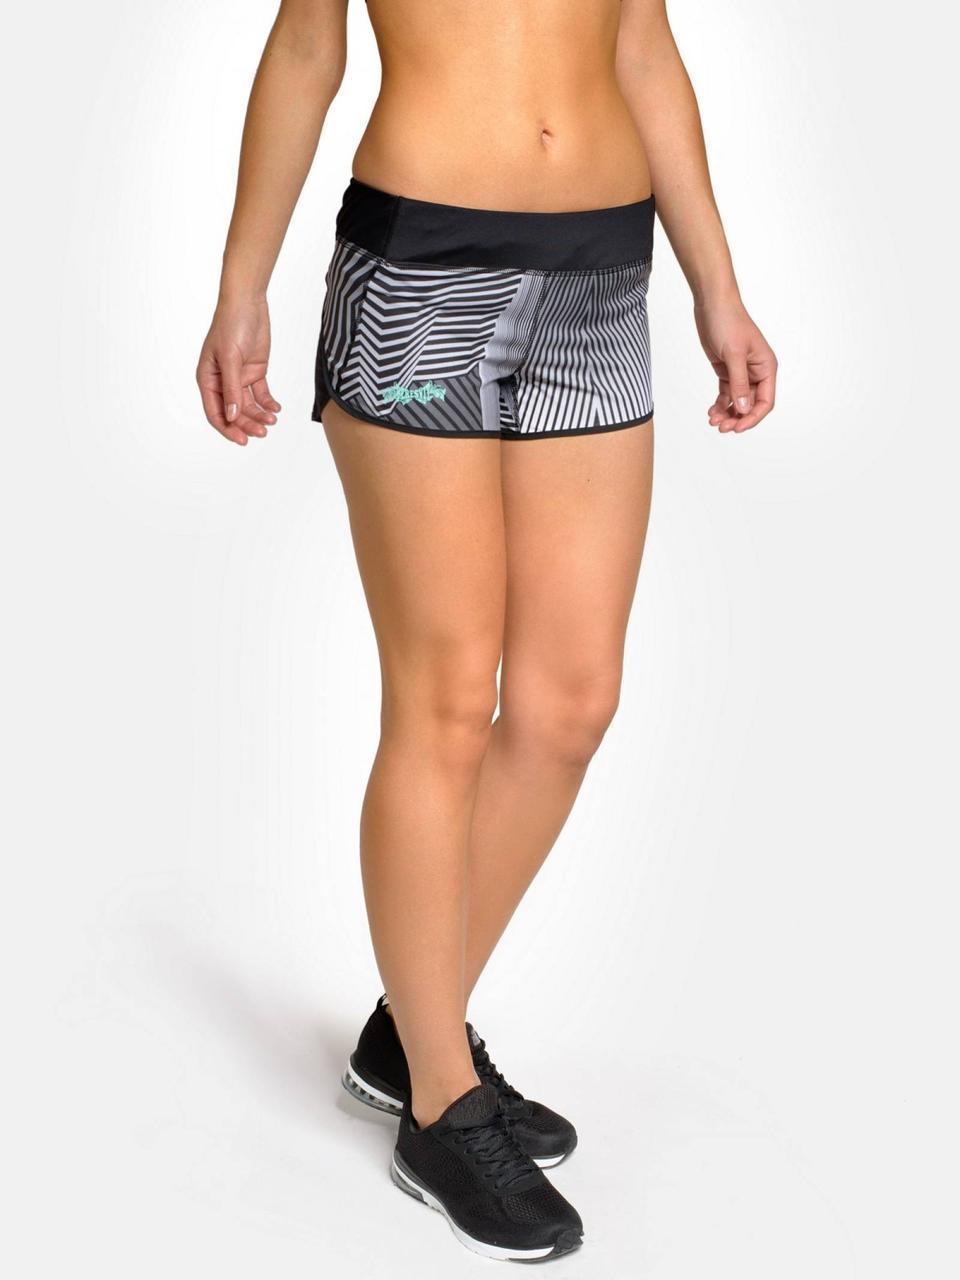 Спортивные шорты Peresvit Air Motion Women's Printed Shorts Insight